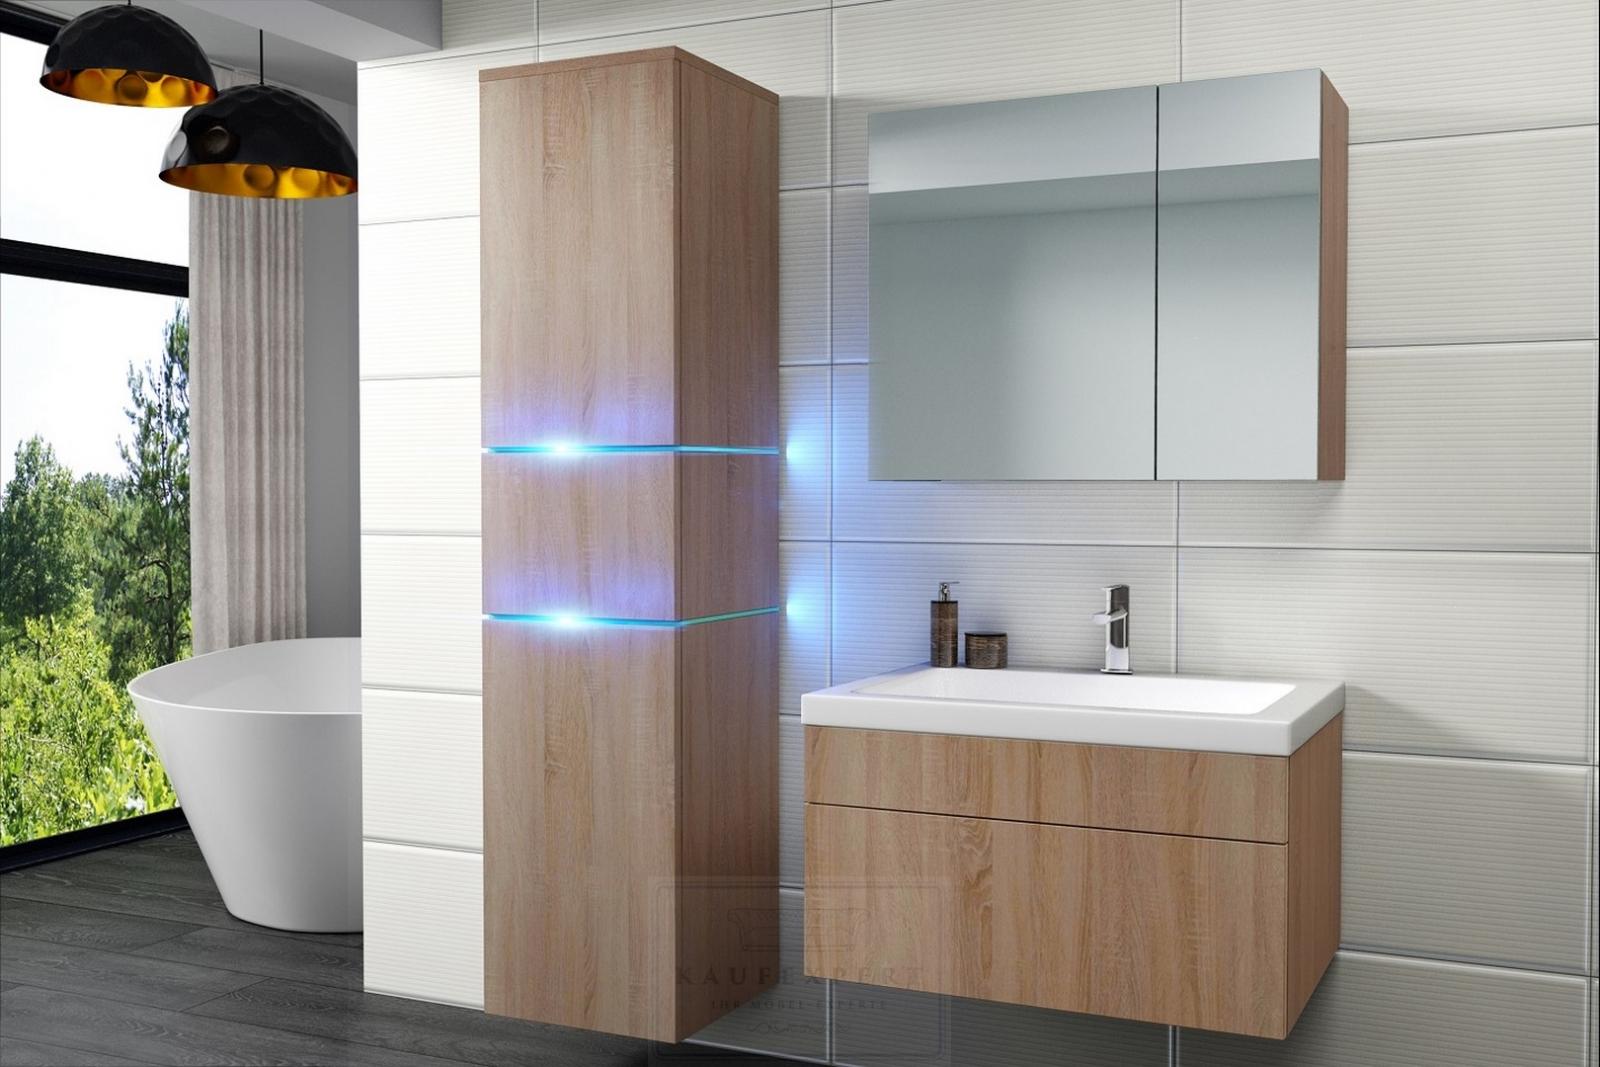 kaufexpert badm bel set ledox 170 cm sonoma eiche keramik waschbecken badezimmer led. Black Bedroom Furniture Sets. Home Design Ideas